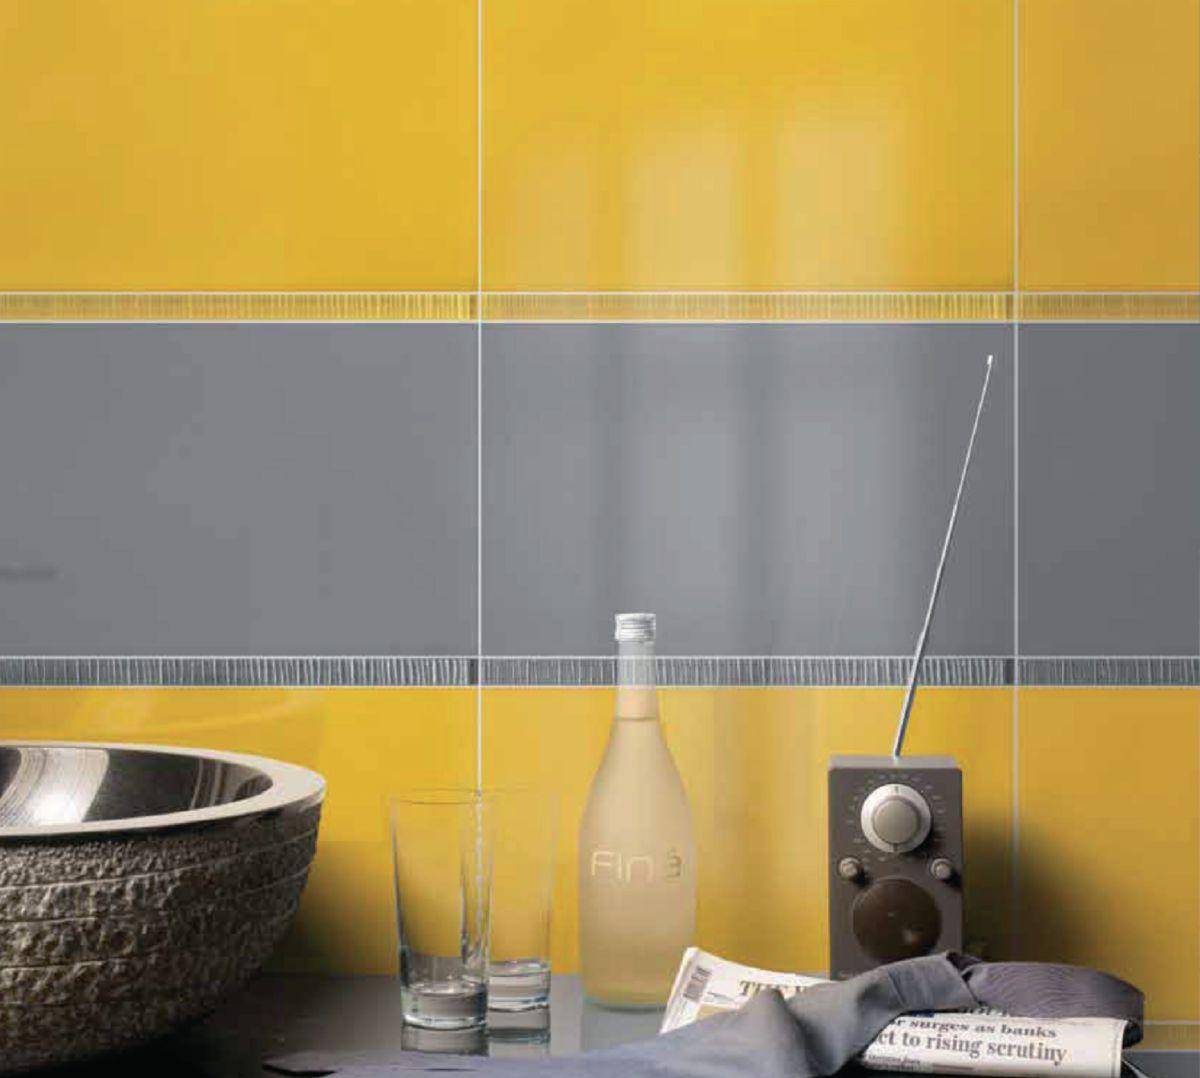 Indogatecom Faience Cuisine Moderne - Carrelage mural cuisine jaune pour idees de deco de cuisine